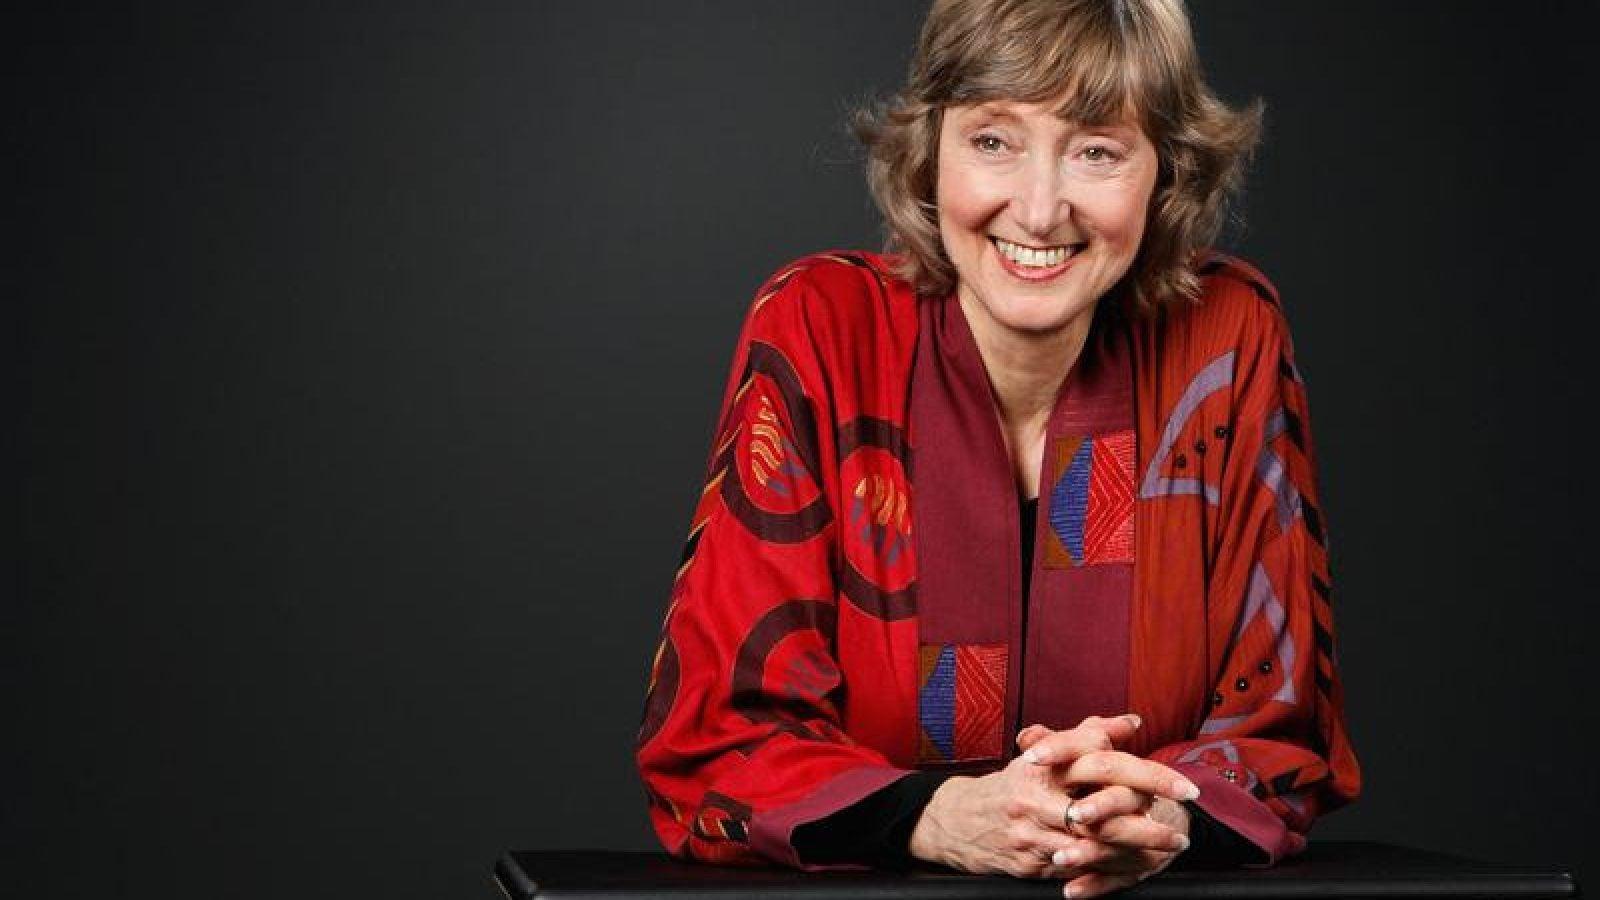 Deborah Tannen wears a red jacket in front of a black background